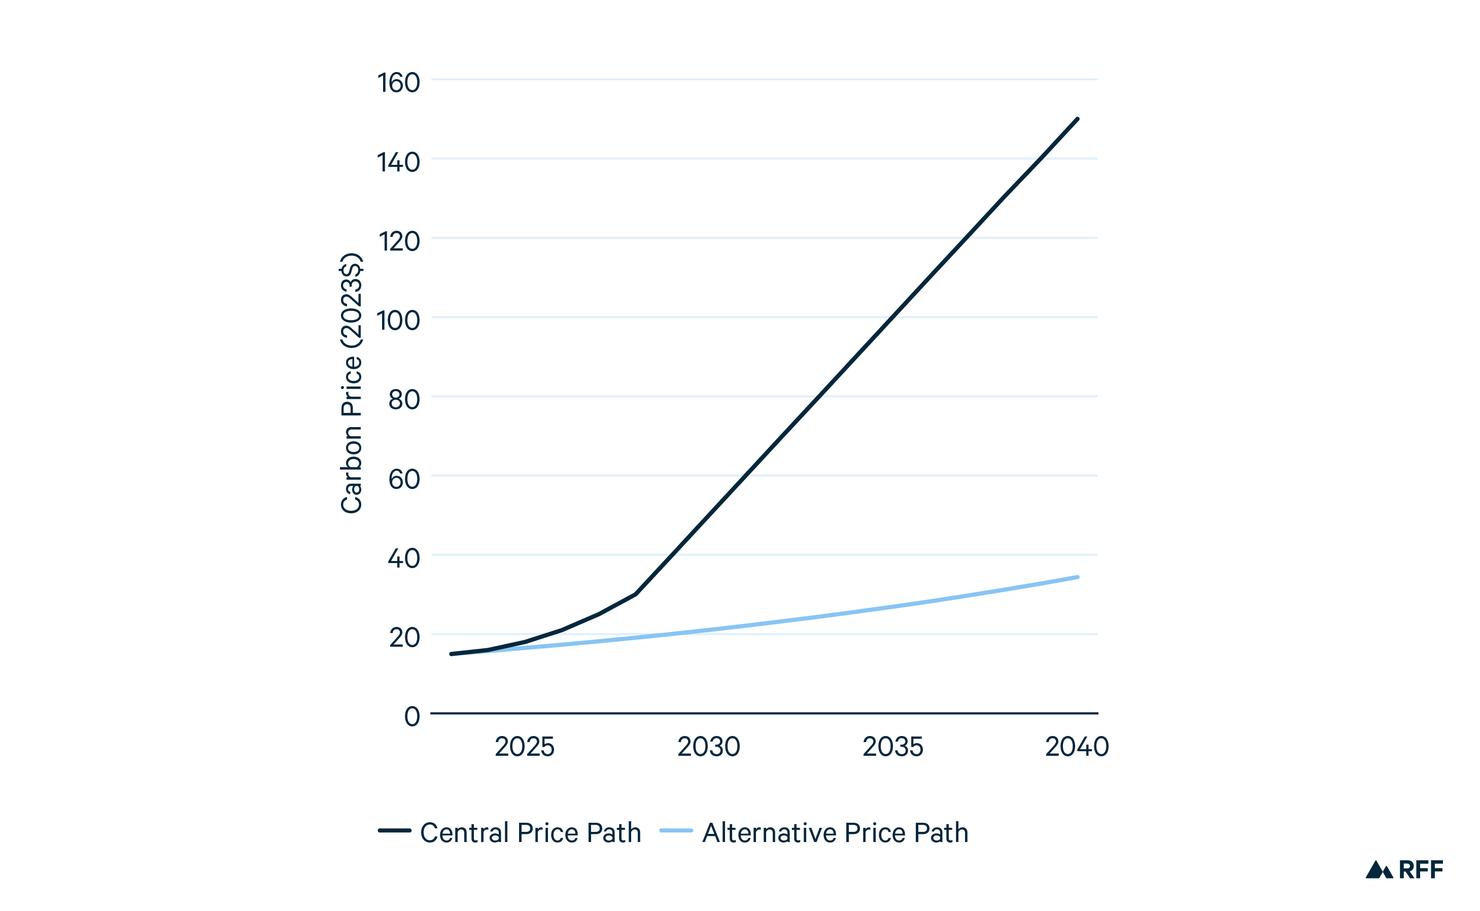 Carbon Price Paths